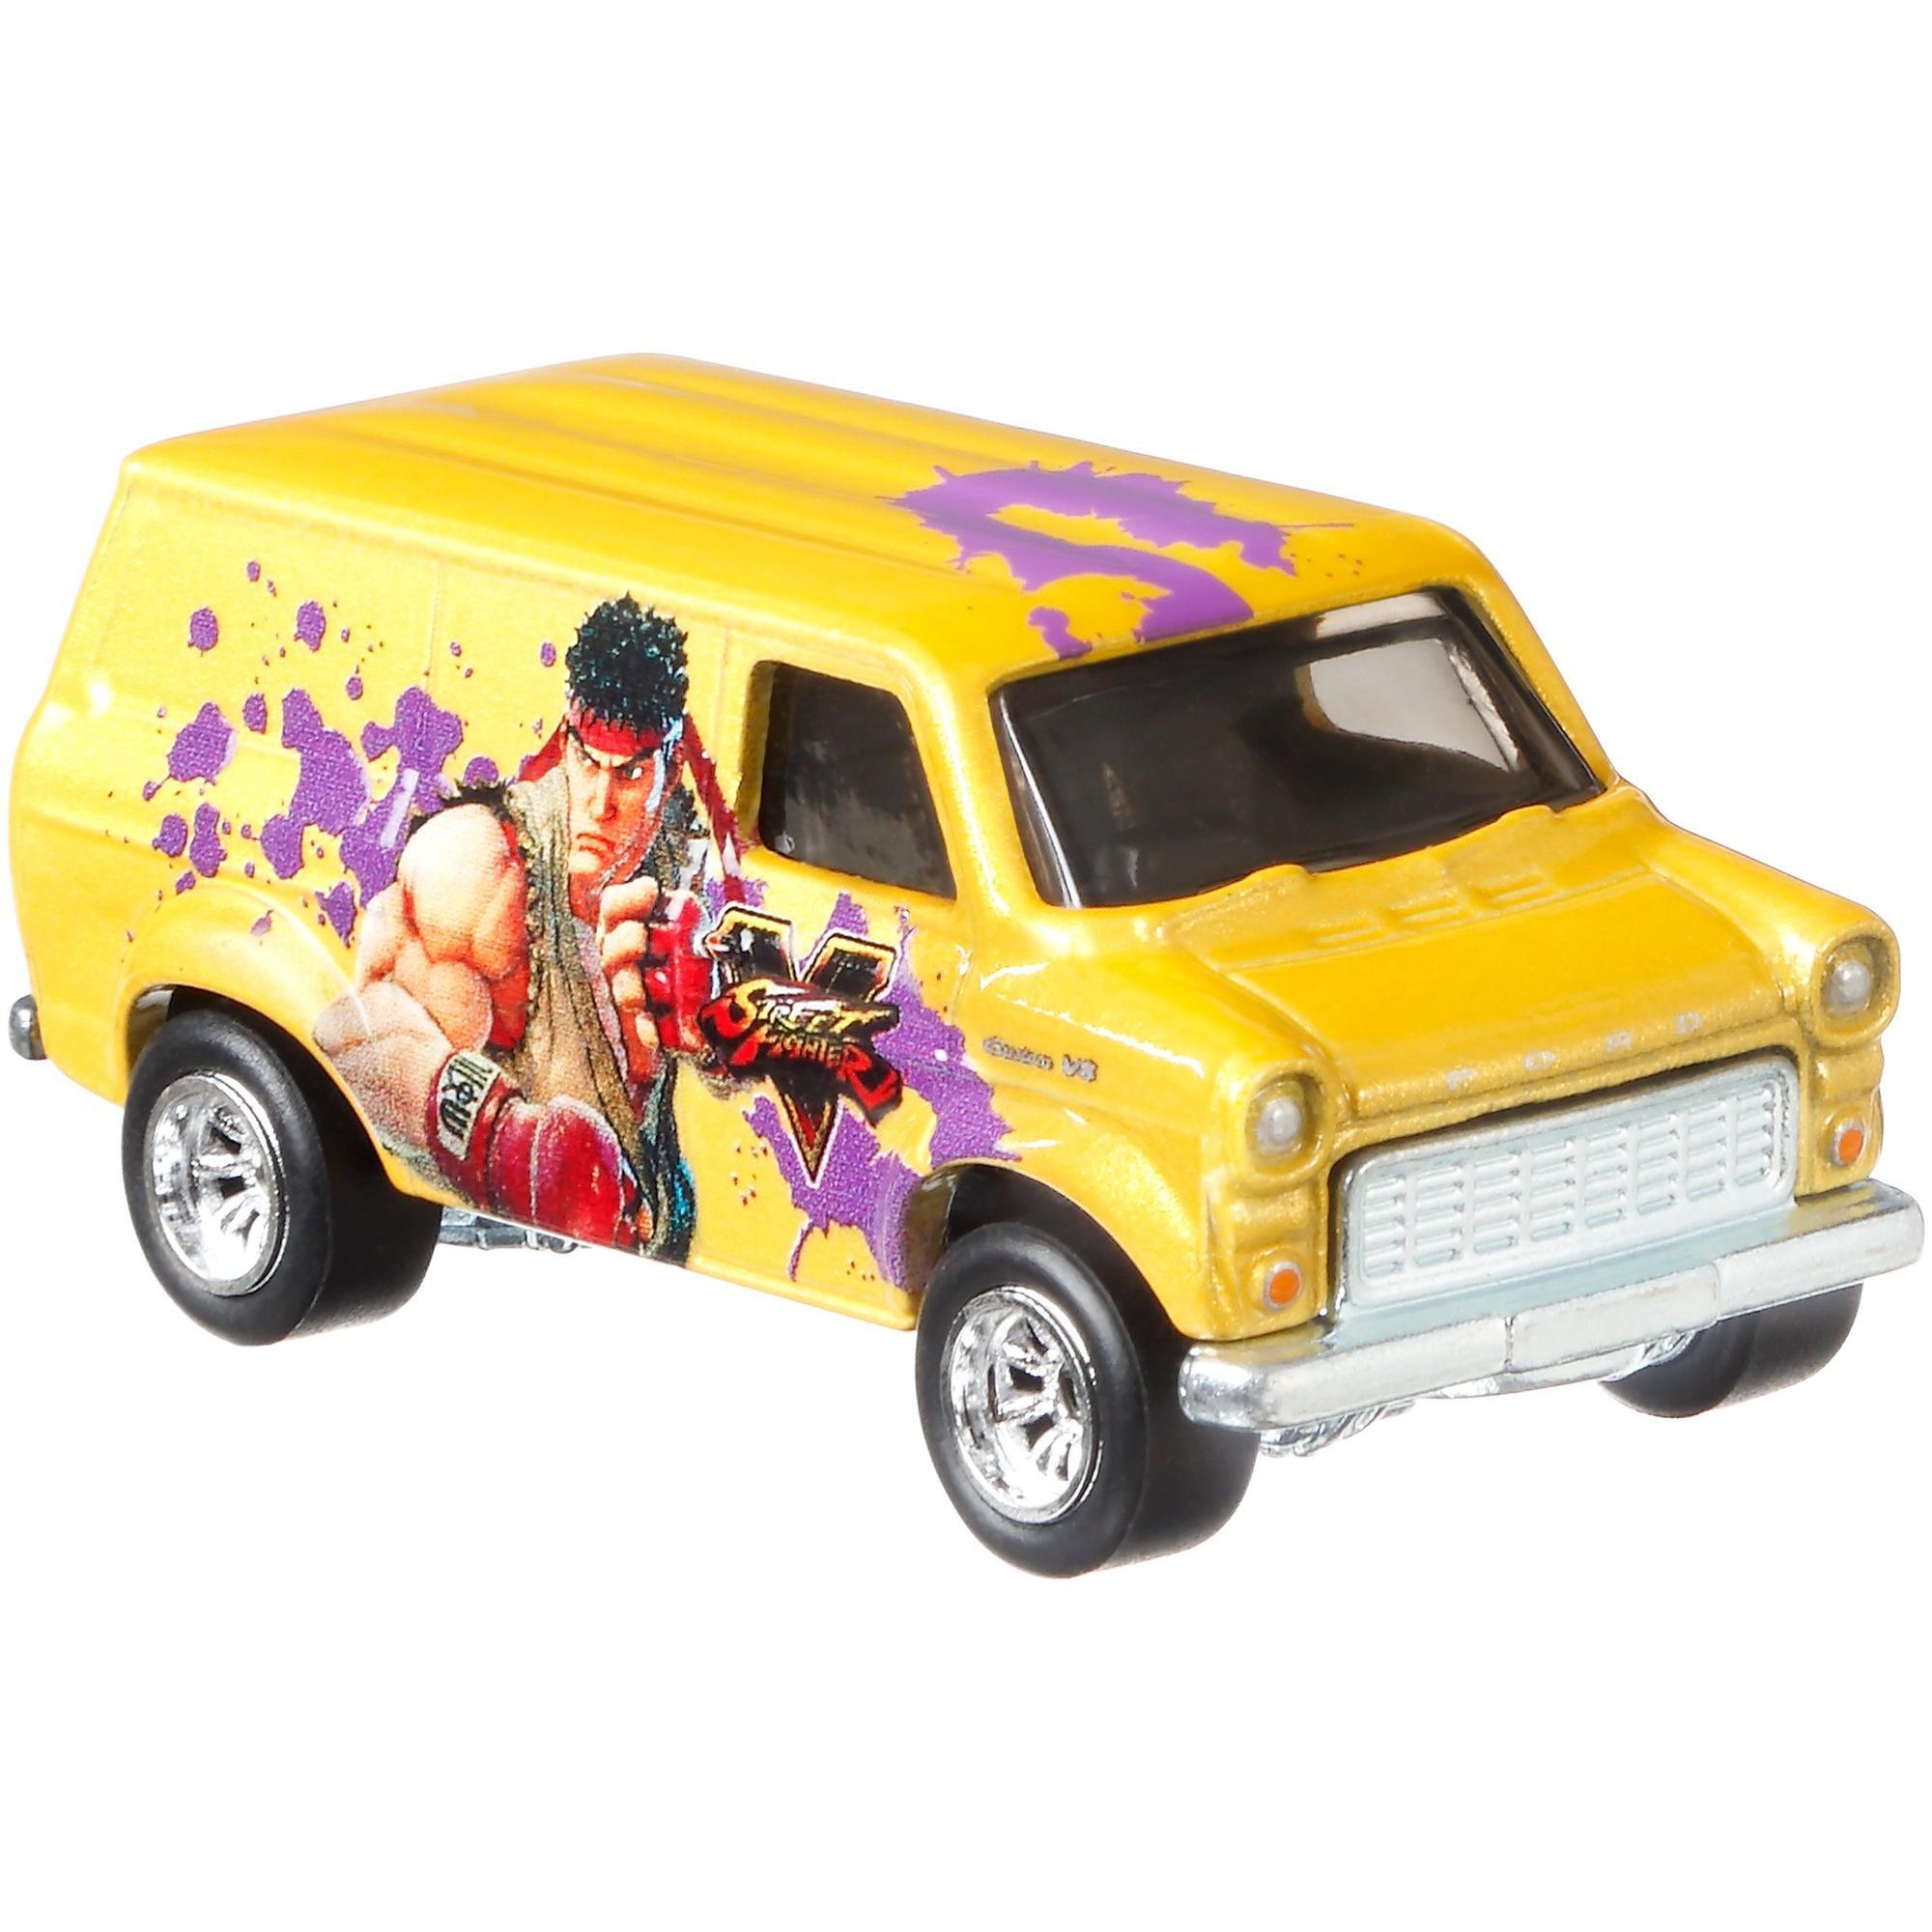 Hot Wheels Premium 1:64 Scale Die-cast Ford Transit Super Van